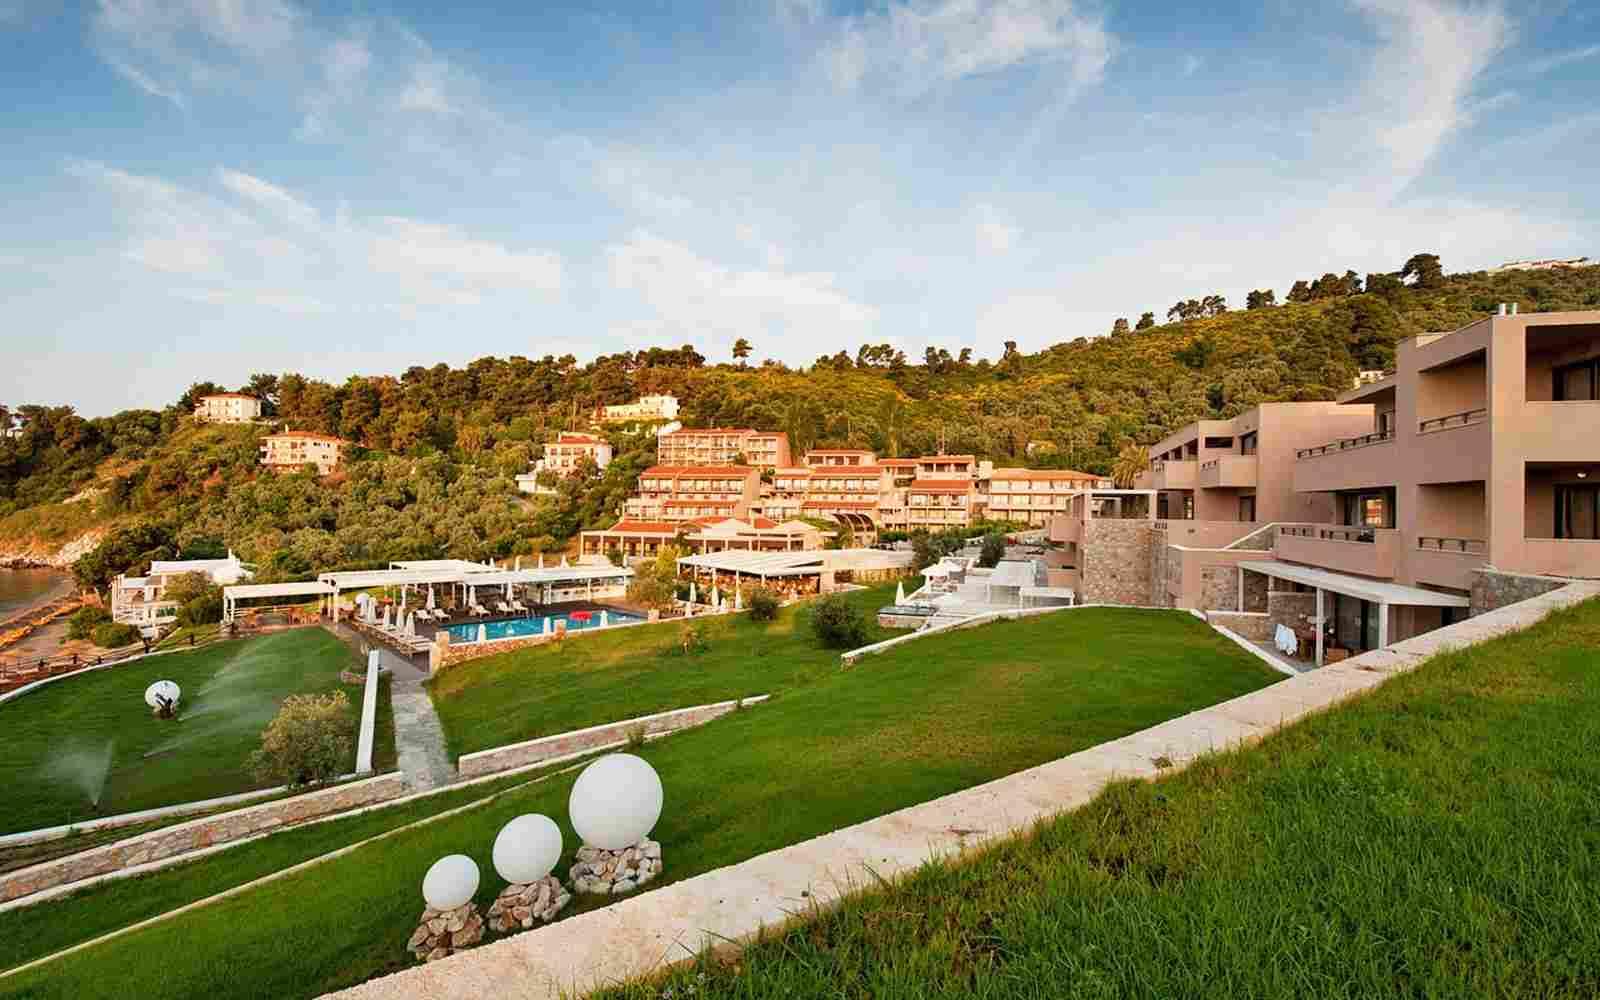 https://www.casacaribepuertomorelos.com/wp-content/uploads/2016/03/summer-hotel-02.jpg